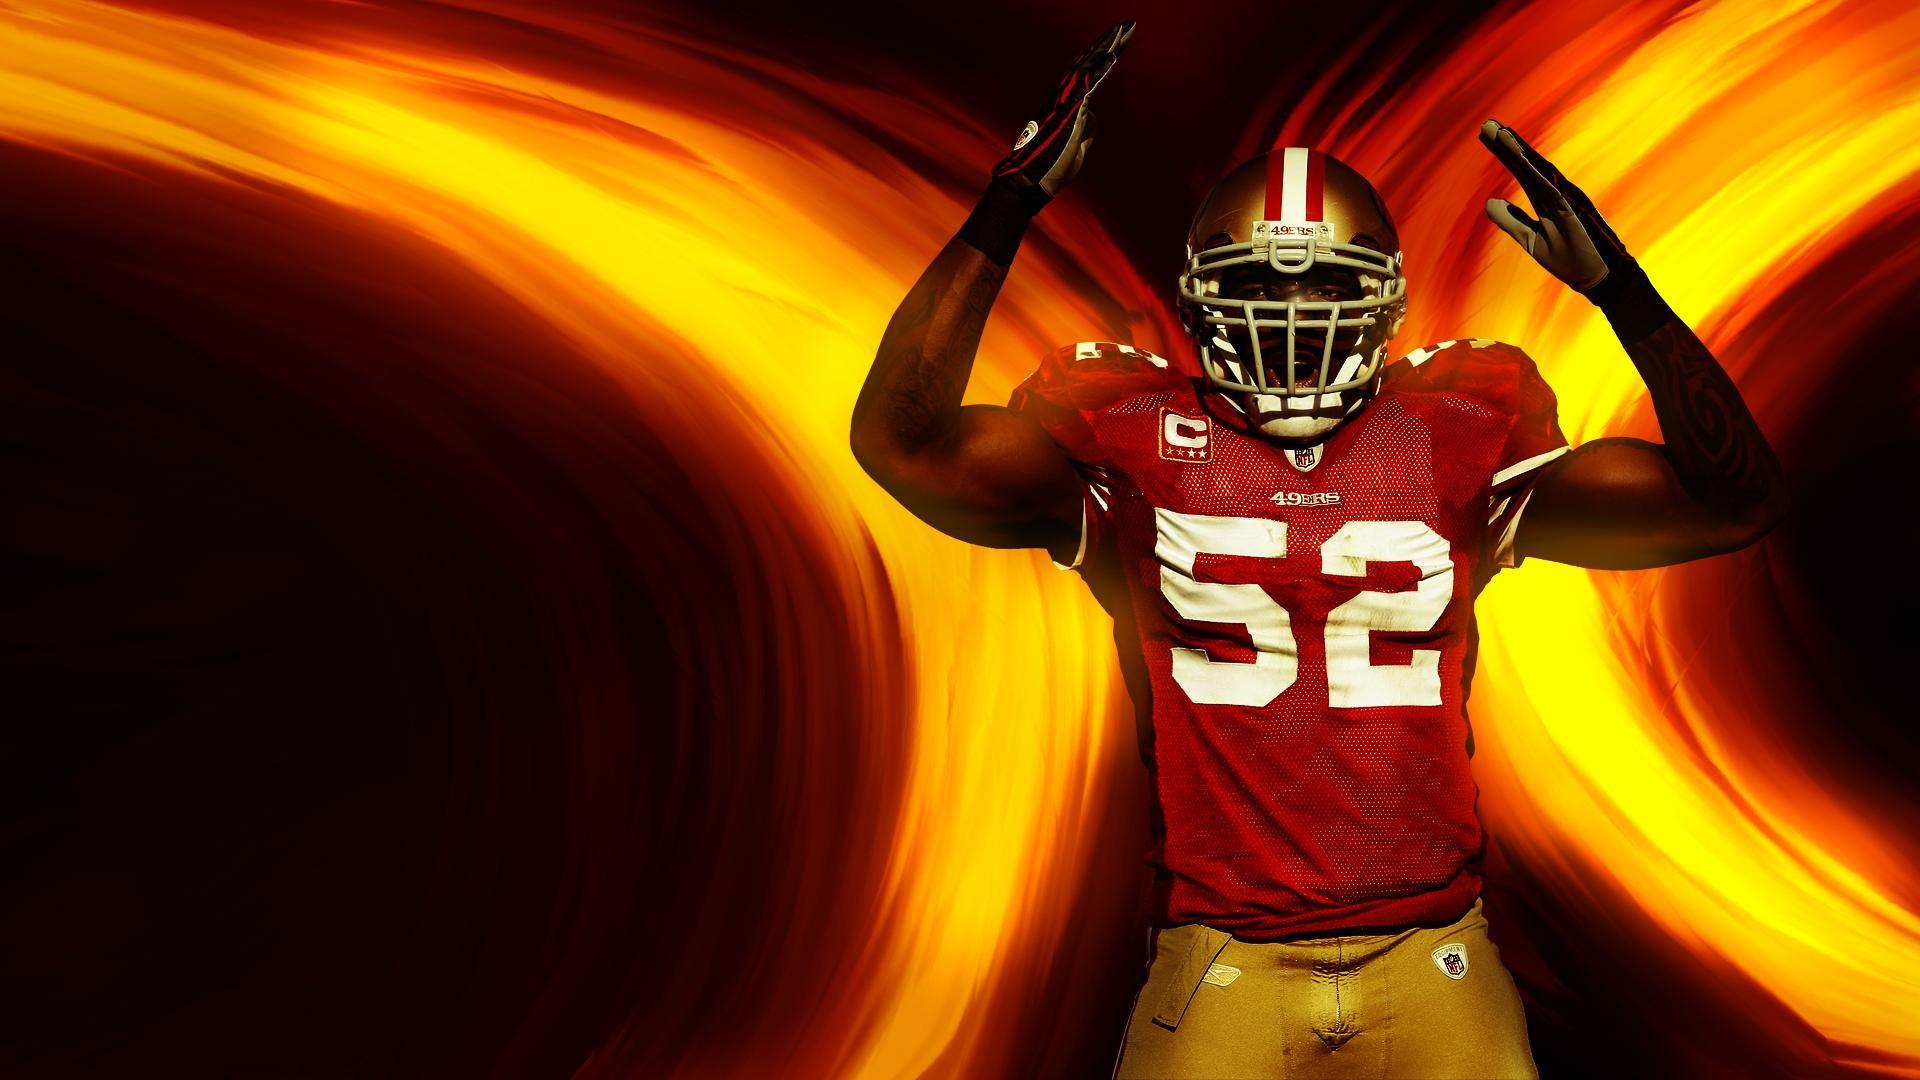 Patrick Willis Hd Wallpaper 49ers Wallpaper Hd 66 Images